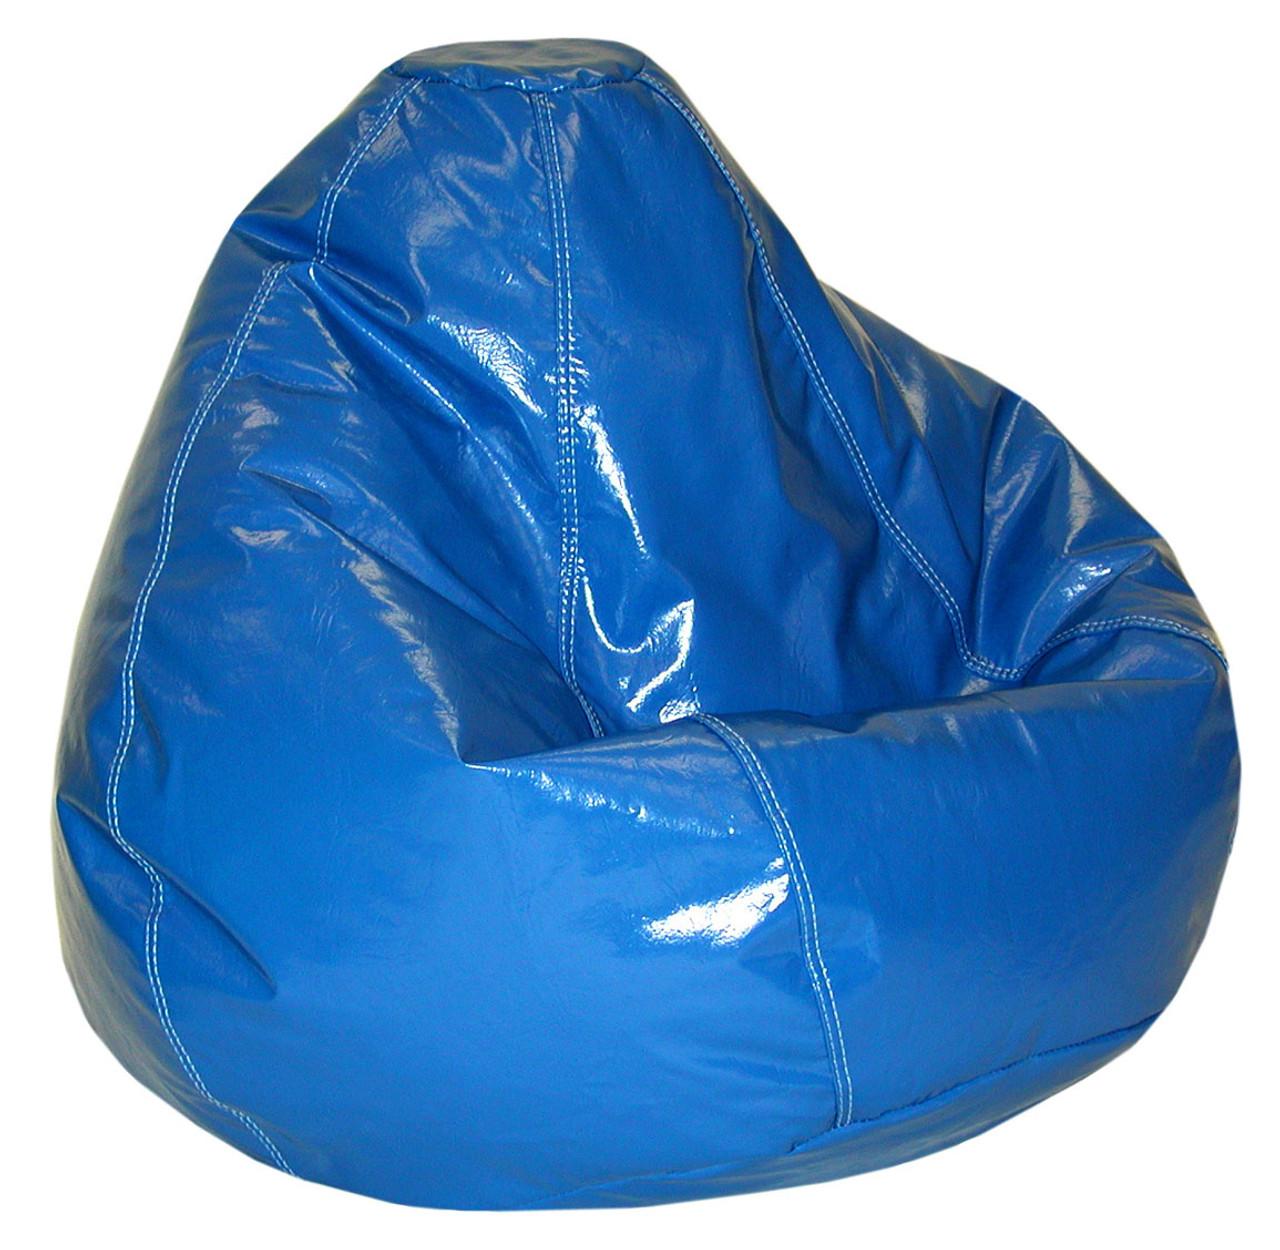 Pleasant Blue Wetlook Large Size Beanbag Machost Co Dining Chair Design Ideas Machostcouk